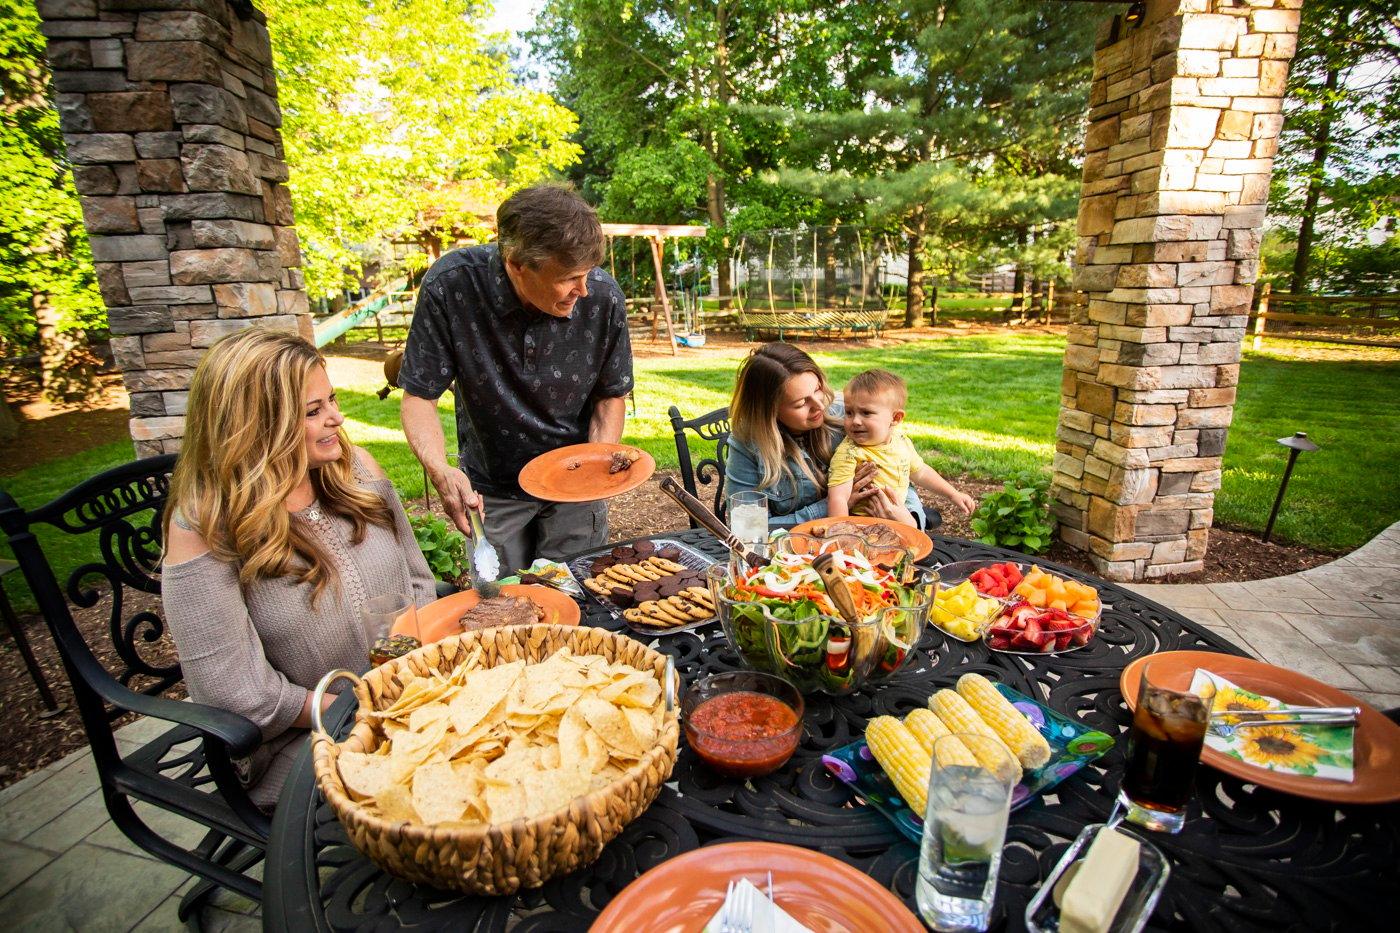 Lori Wittwer enjoying dinner with her family